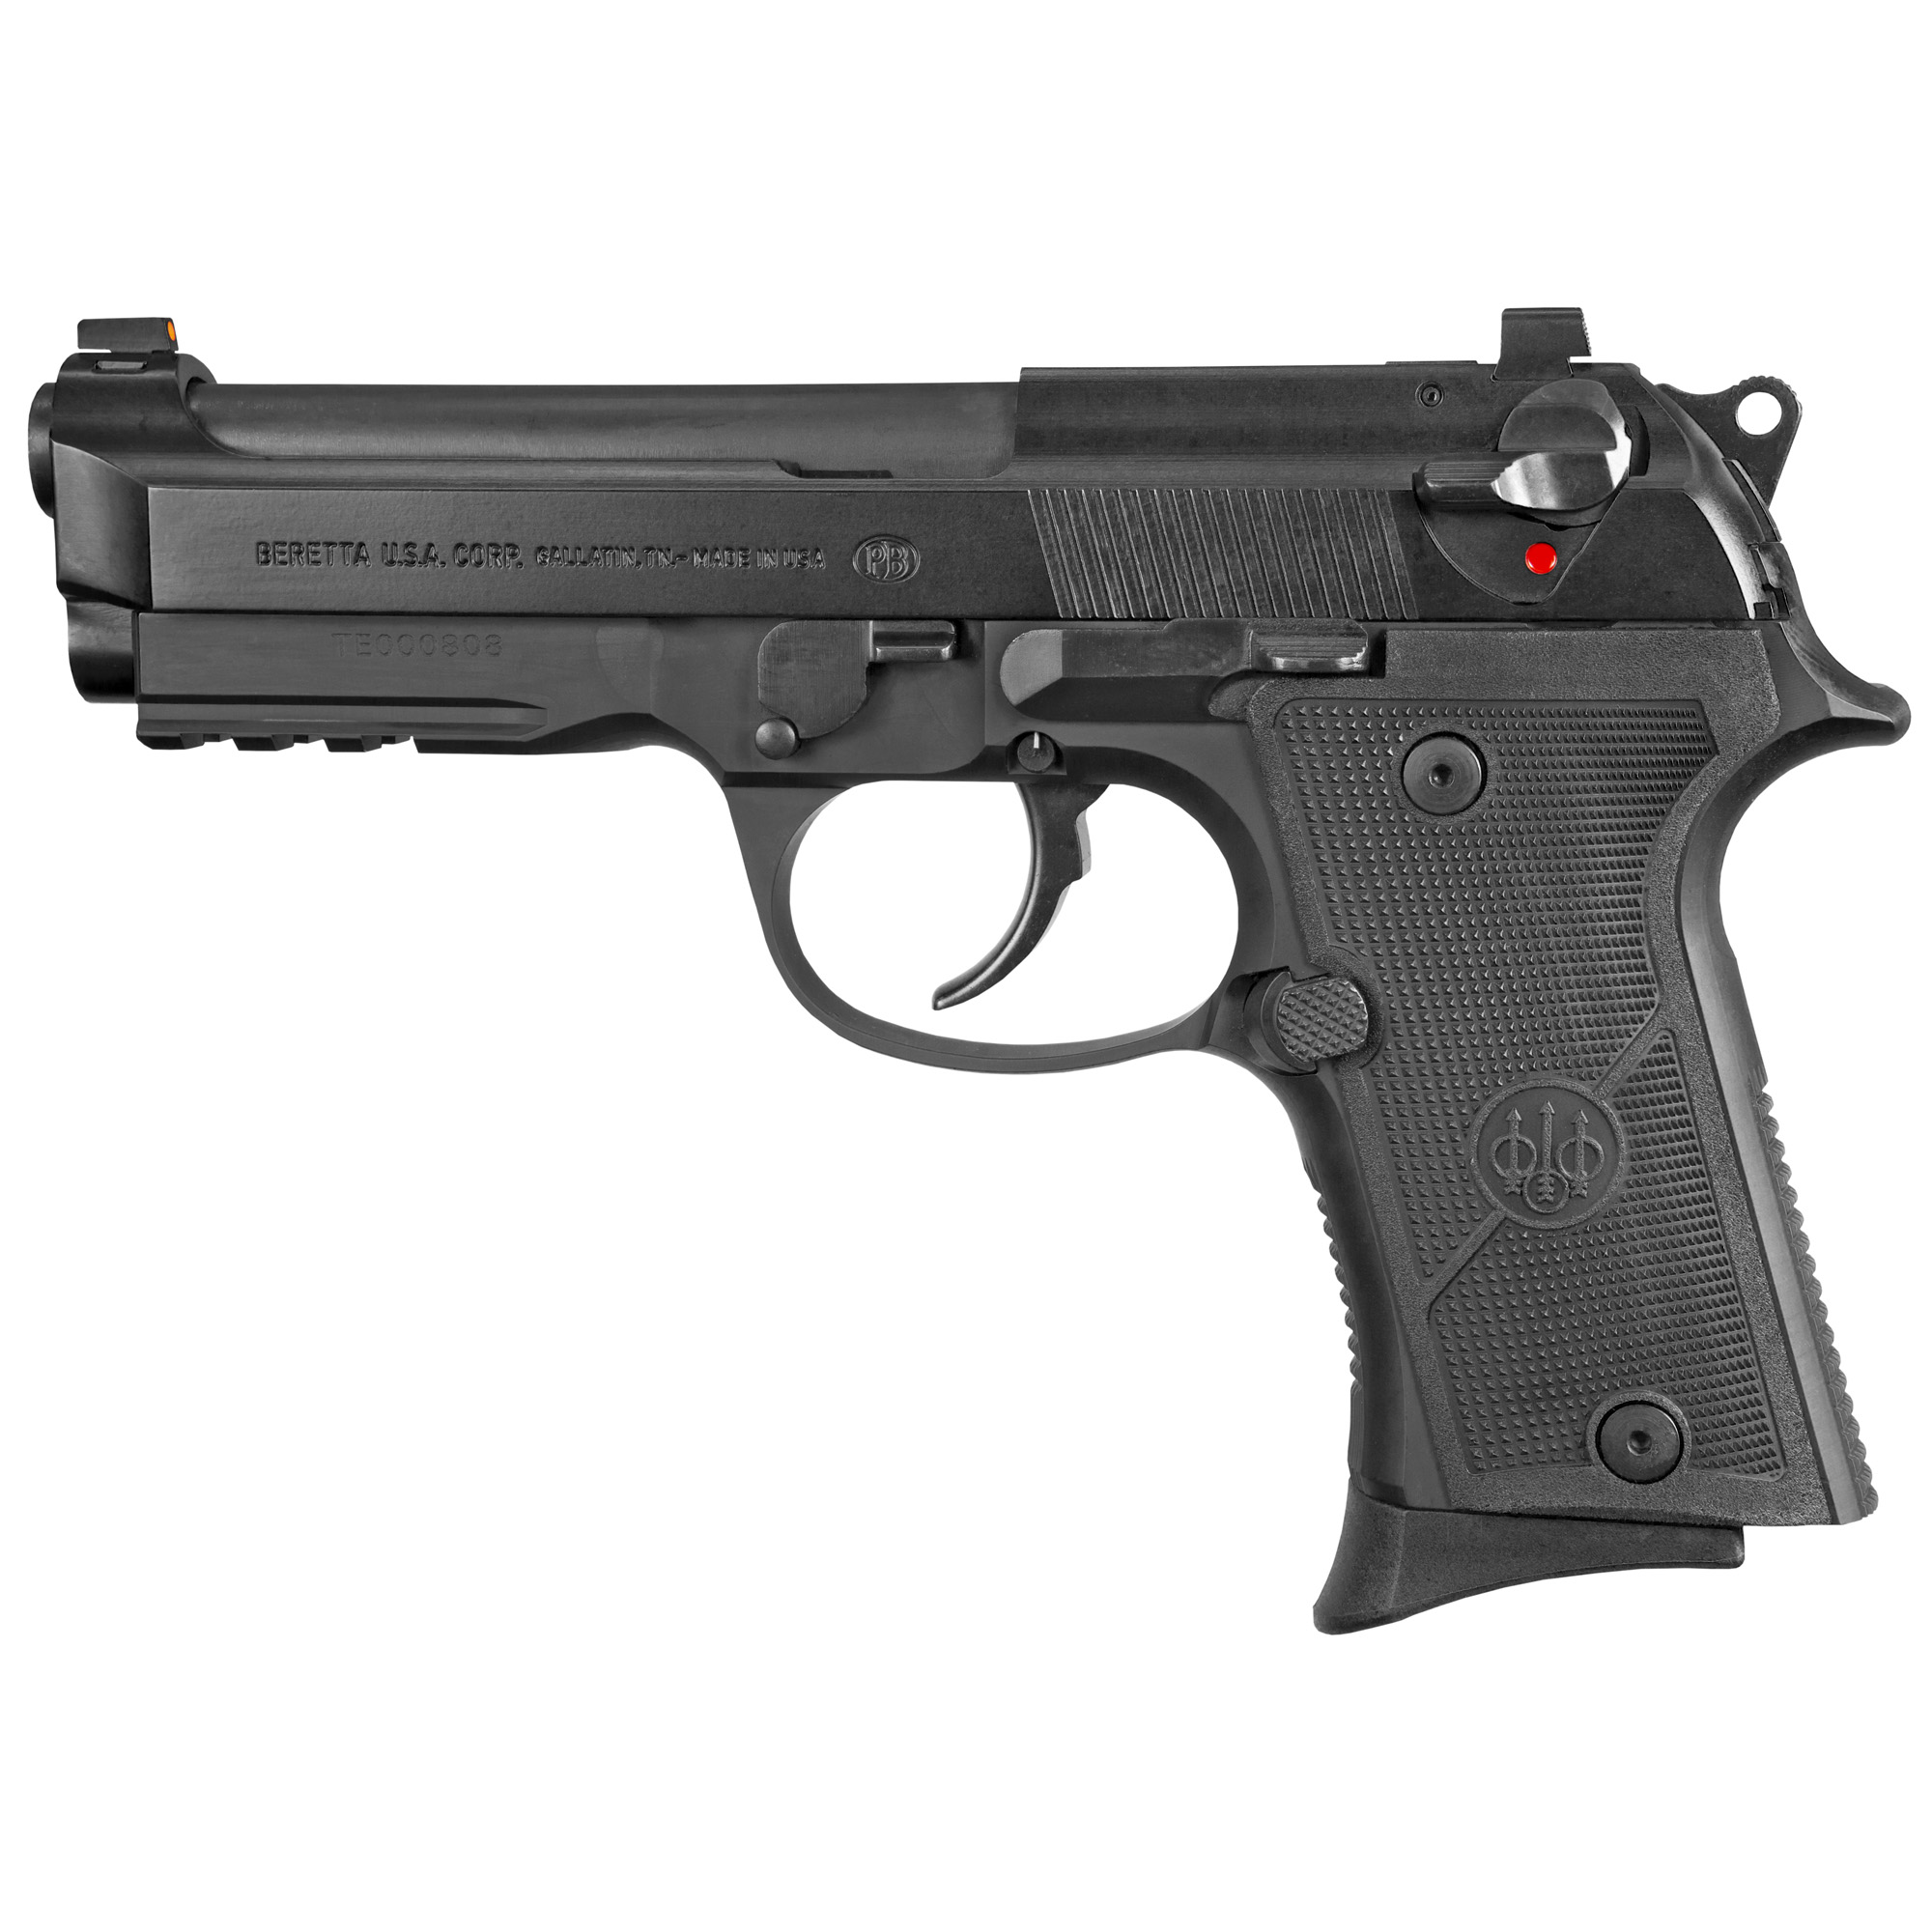 "Beretta 92x Gr Cmp-r 9mm 4.3"" 10rd"